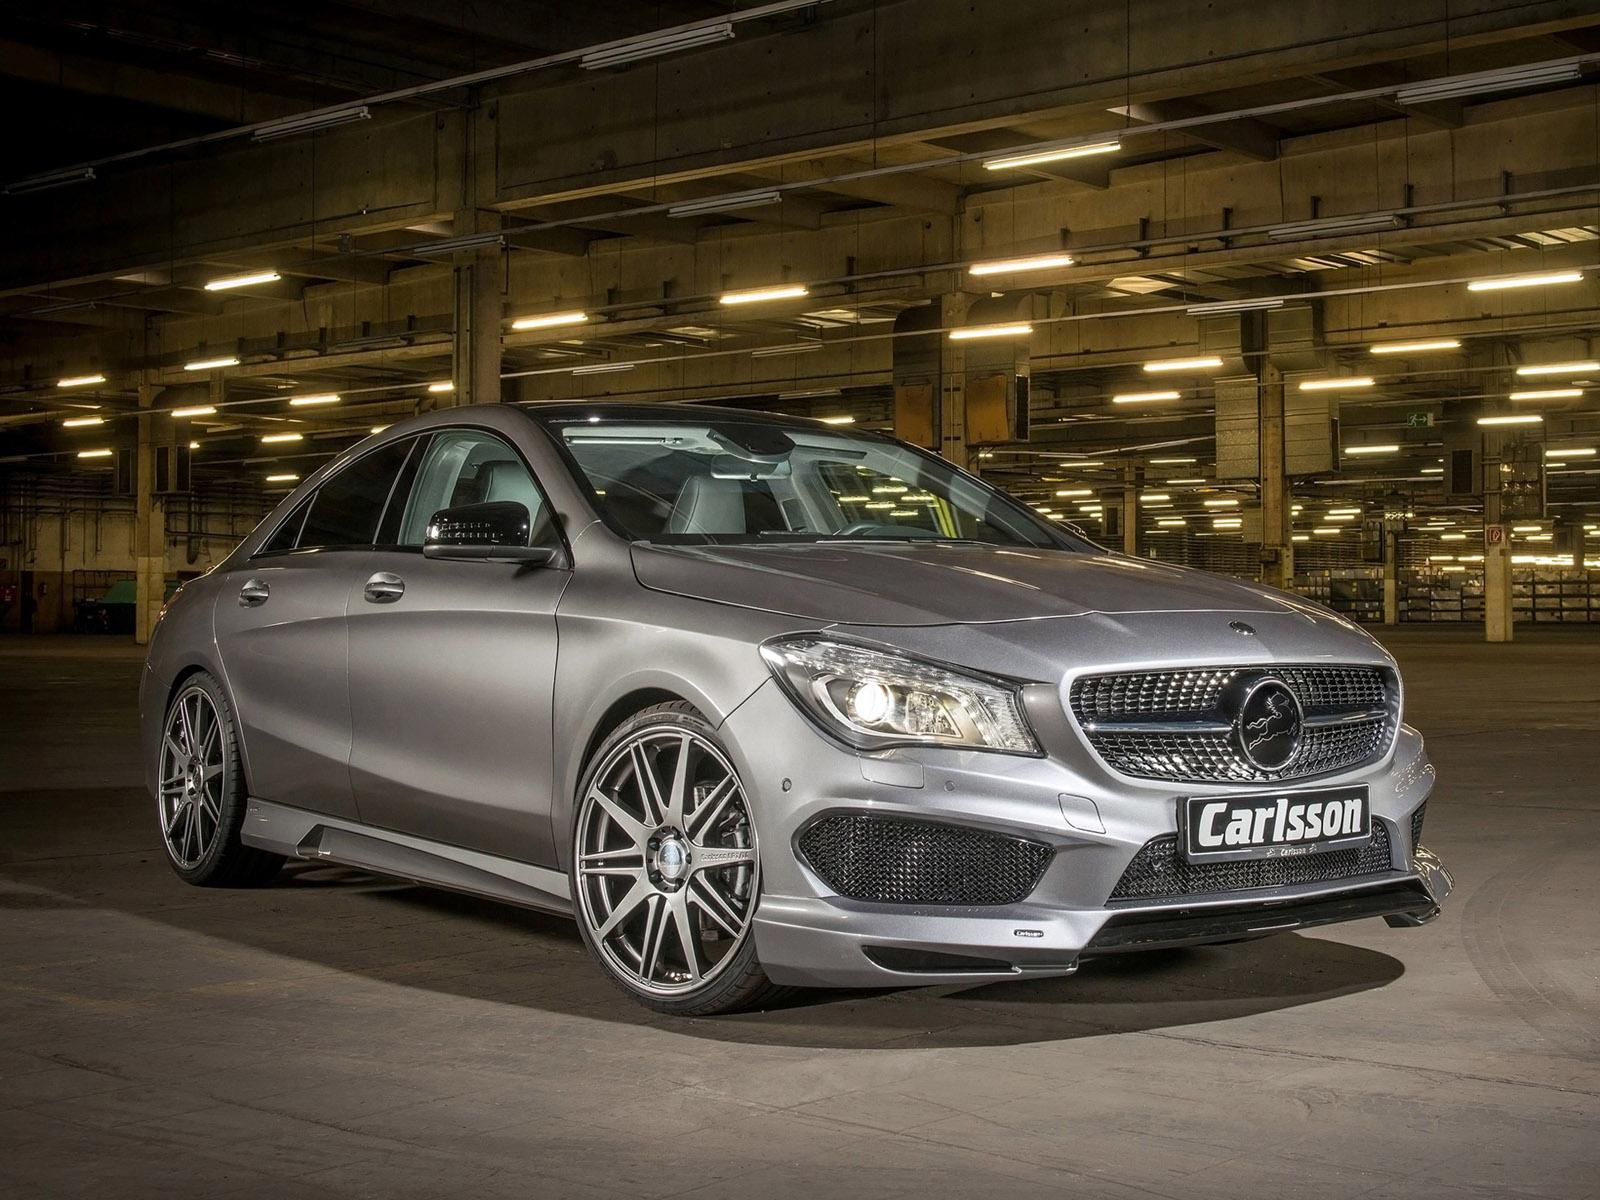 Mercedes CLA CCA 20 C117 (2014) - Carlsson